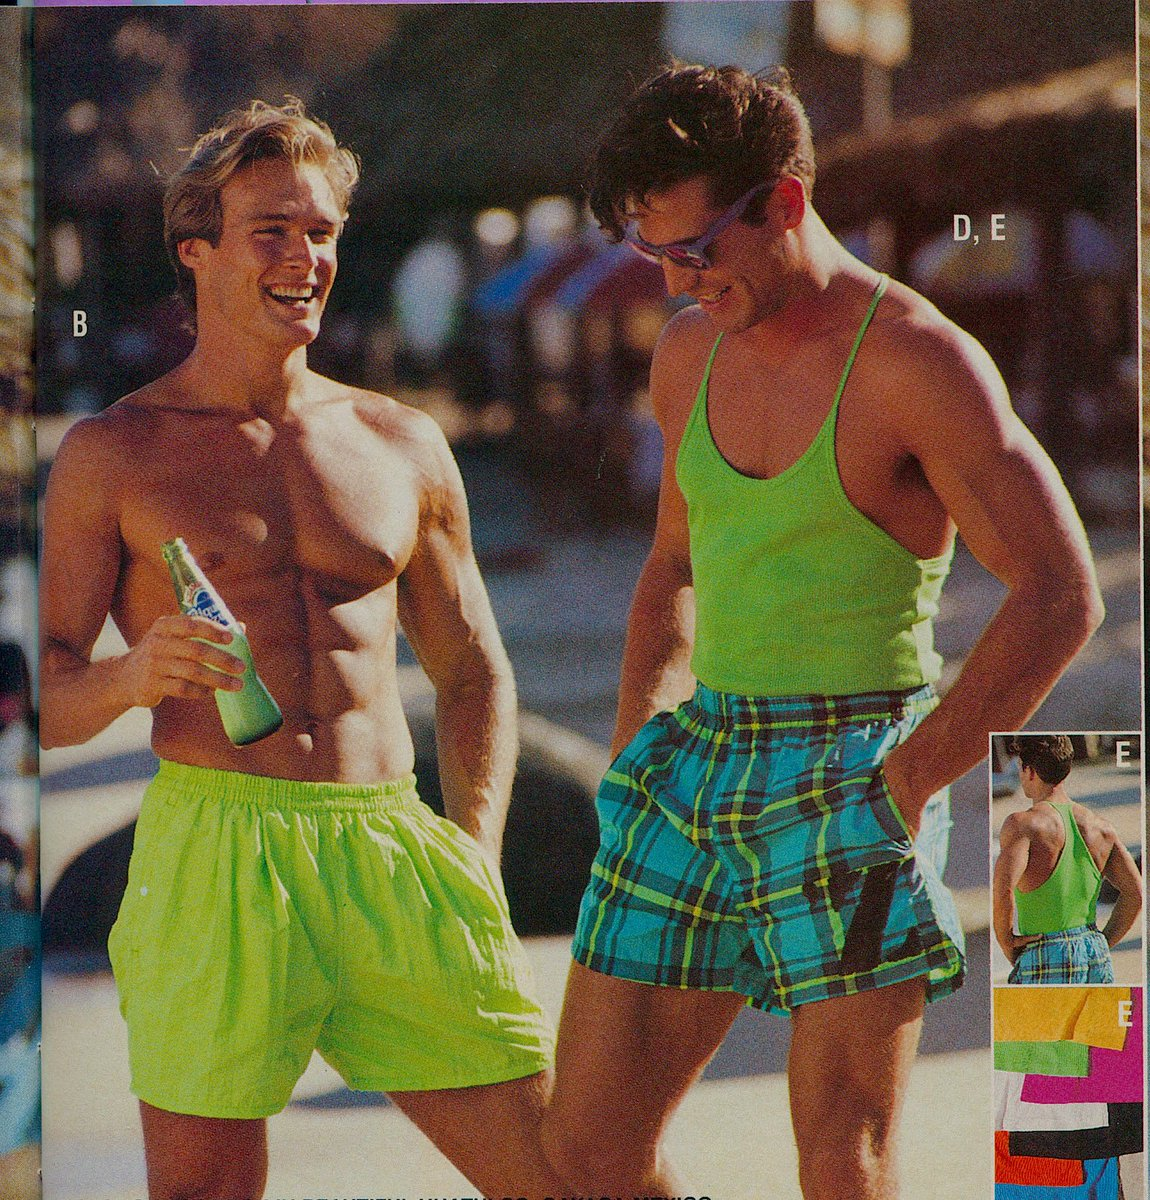 e62977bacf #allman #internationalmale #undergear #menswear #documentaryfilm # mensfashion #masculinity #vintageswimwear #menofinternationalmale #men ...